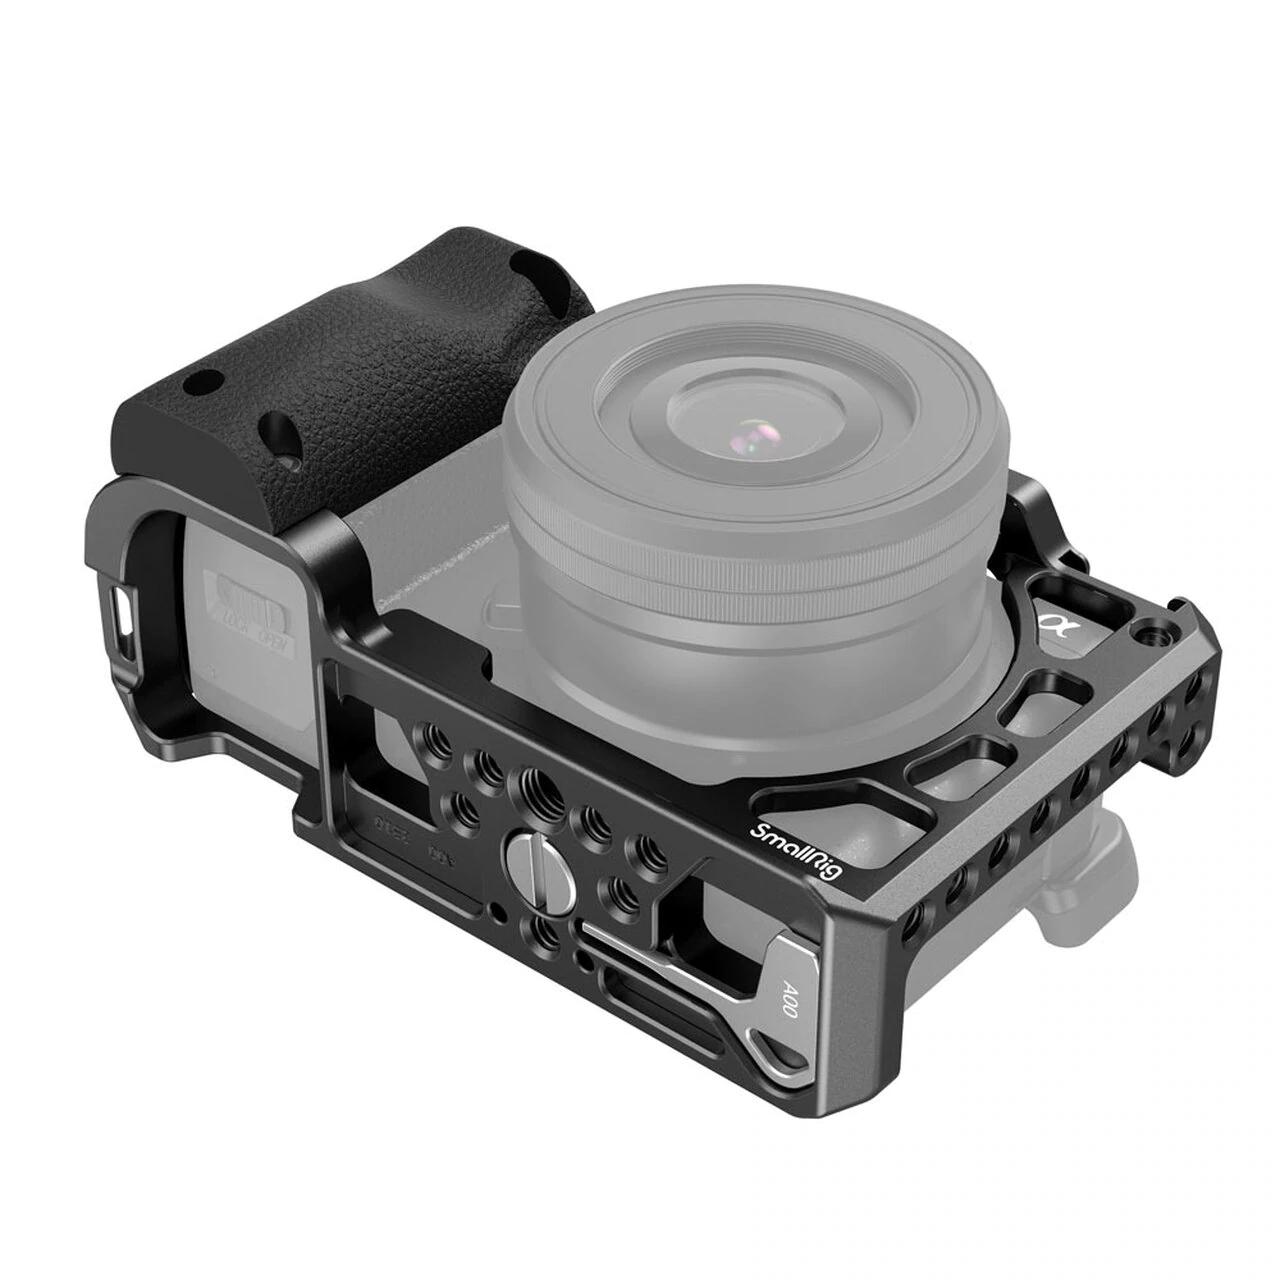 smallrig-3164-06-sony-a6-camera-cage-silicone-grip-klatka-z-gripem.jpg